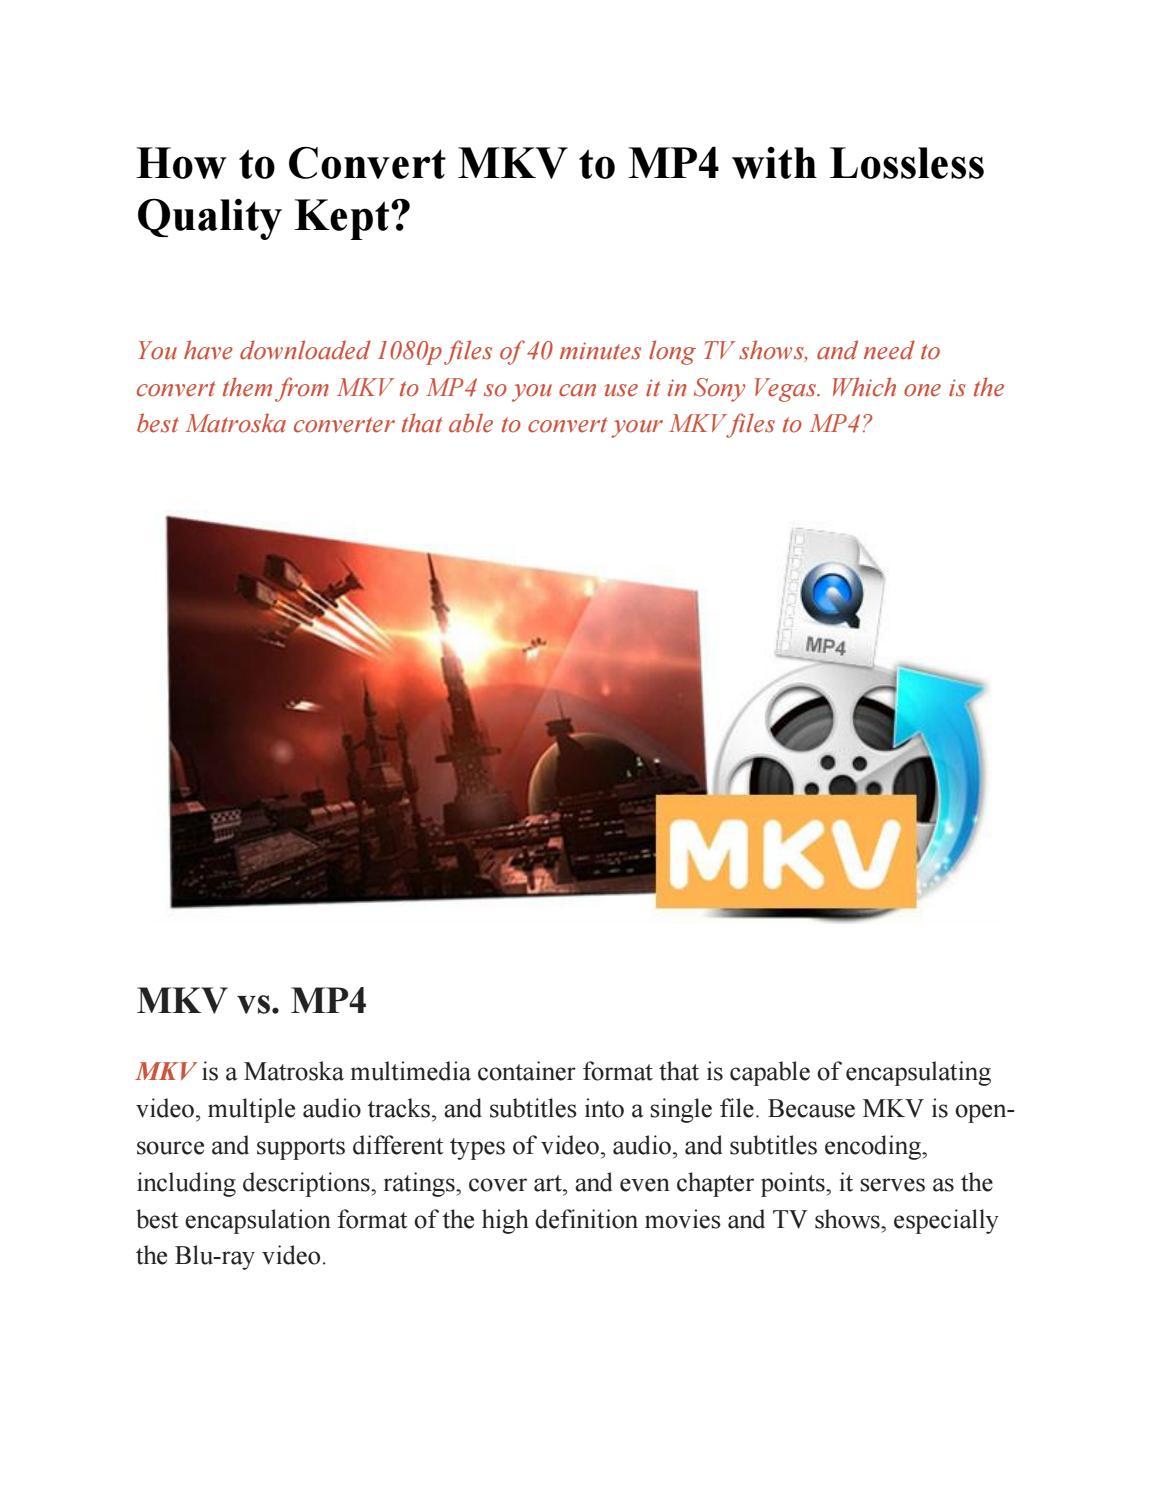 Mkv Vs Mp4 : Convert, Lossless, Quality, Kept?, Paris, Young, Issuu